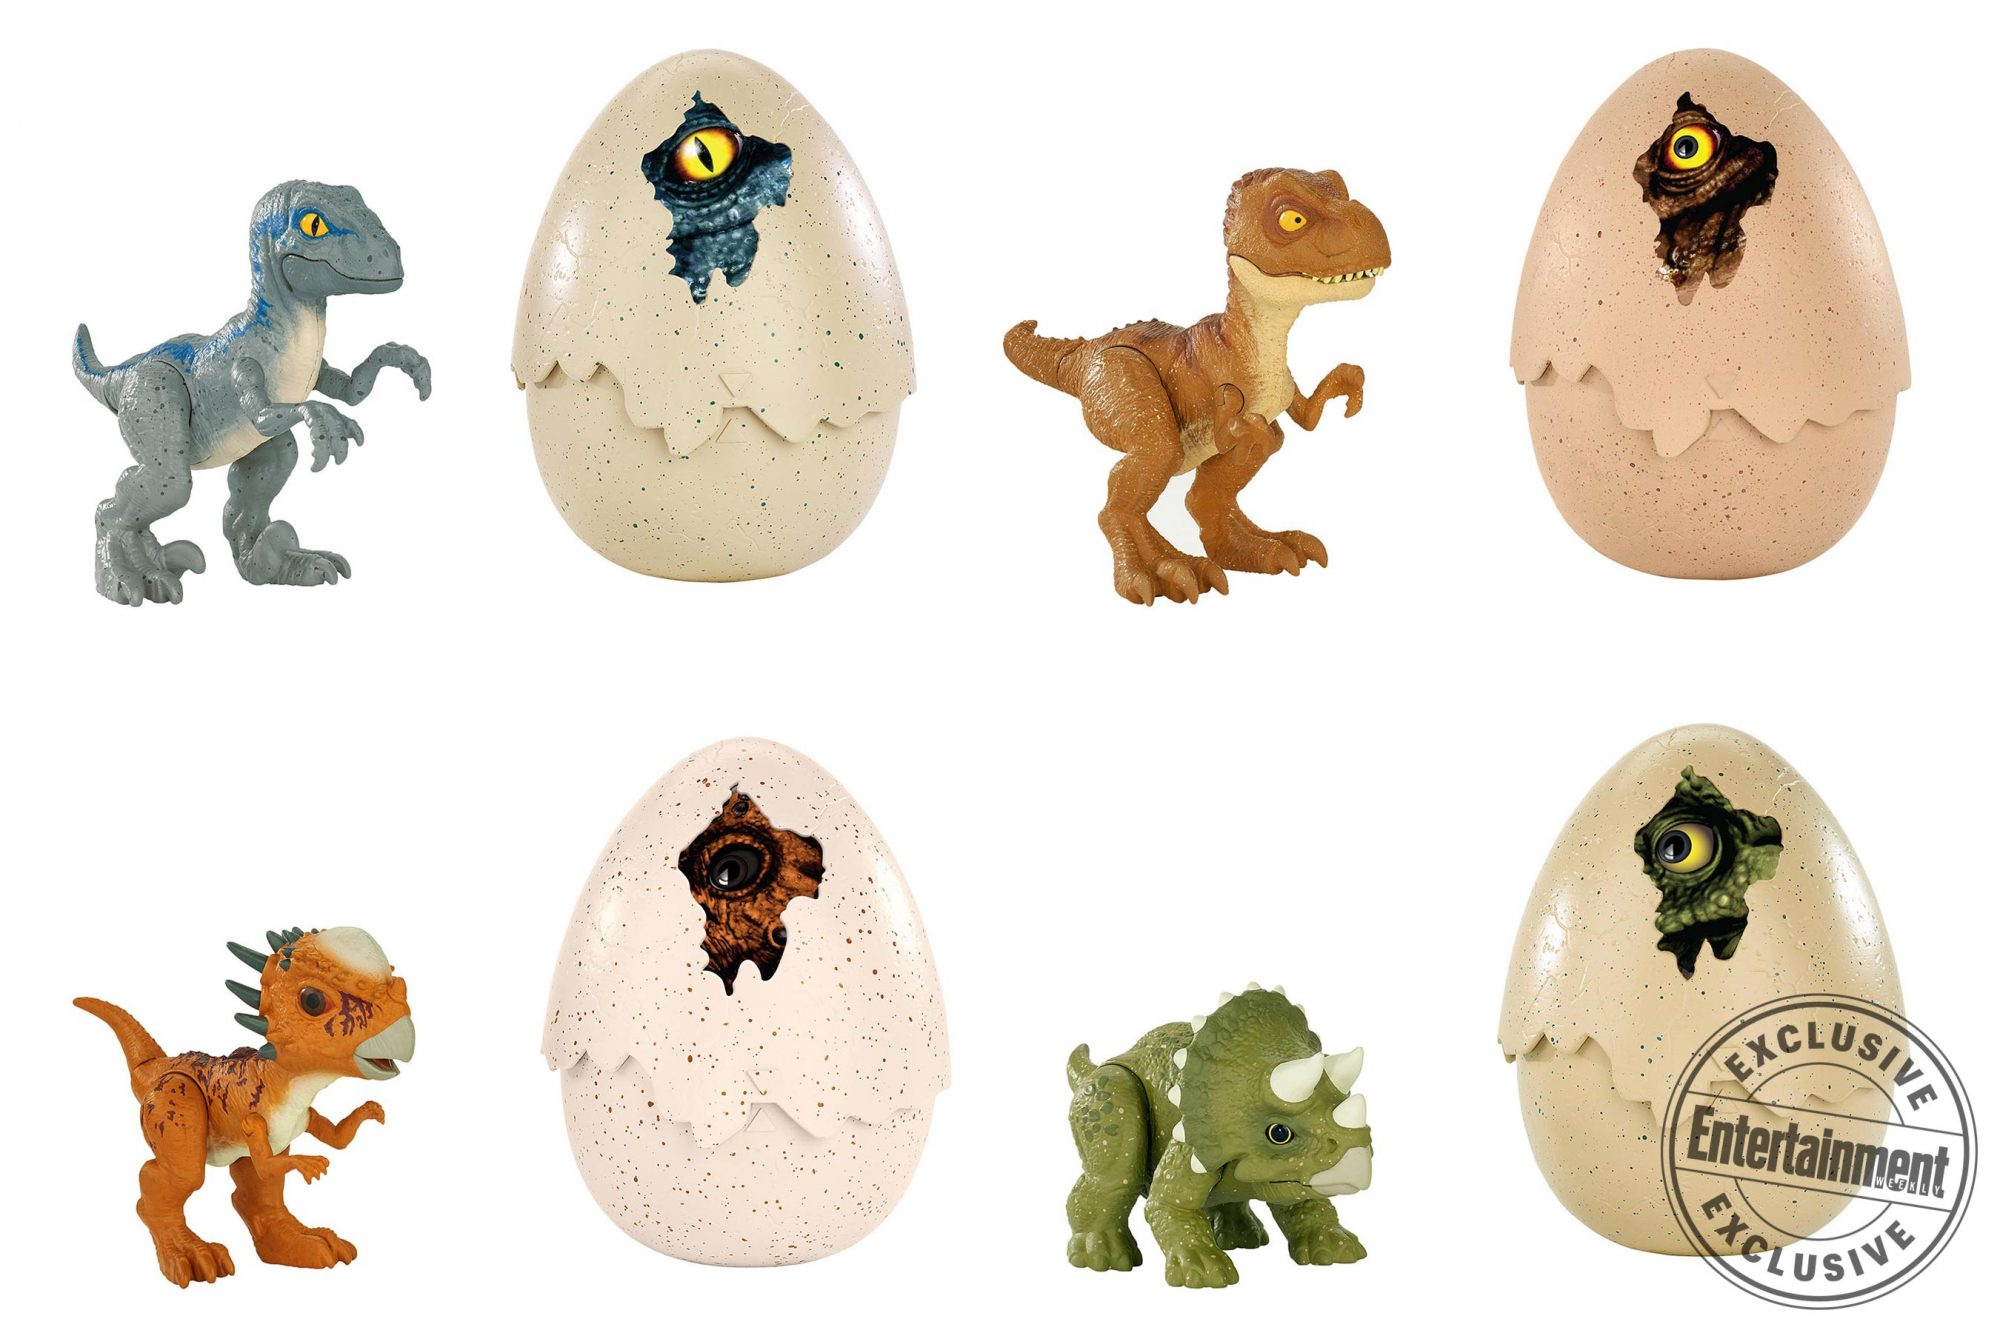 Jurassic-World-Toys-16